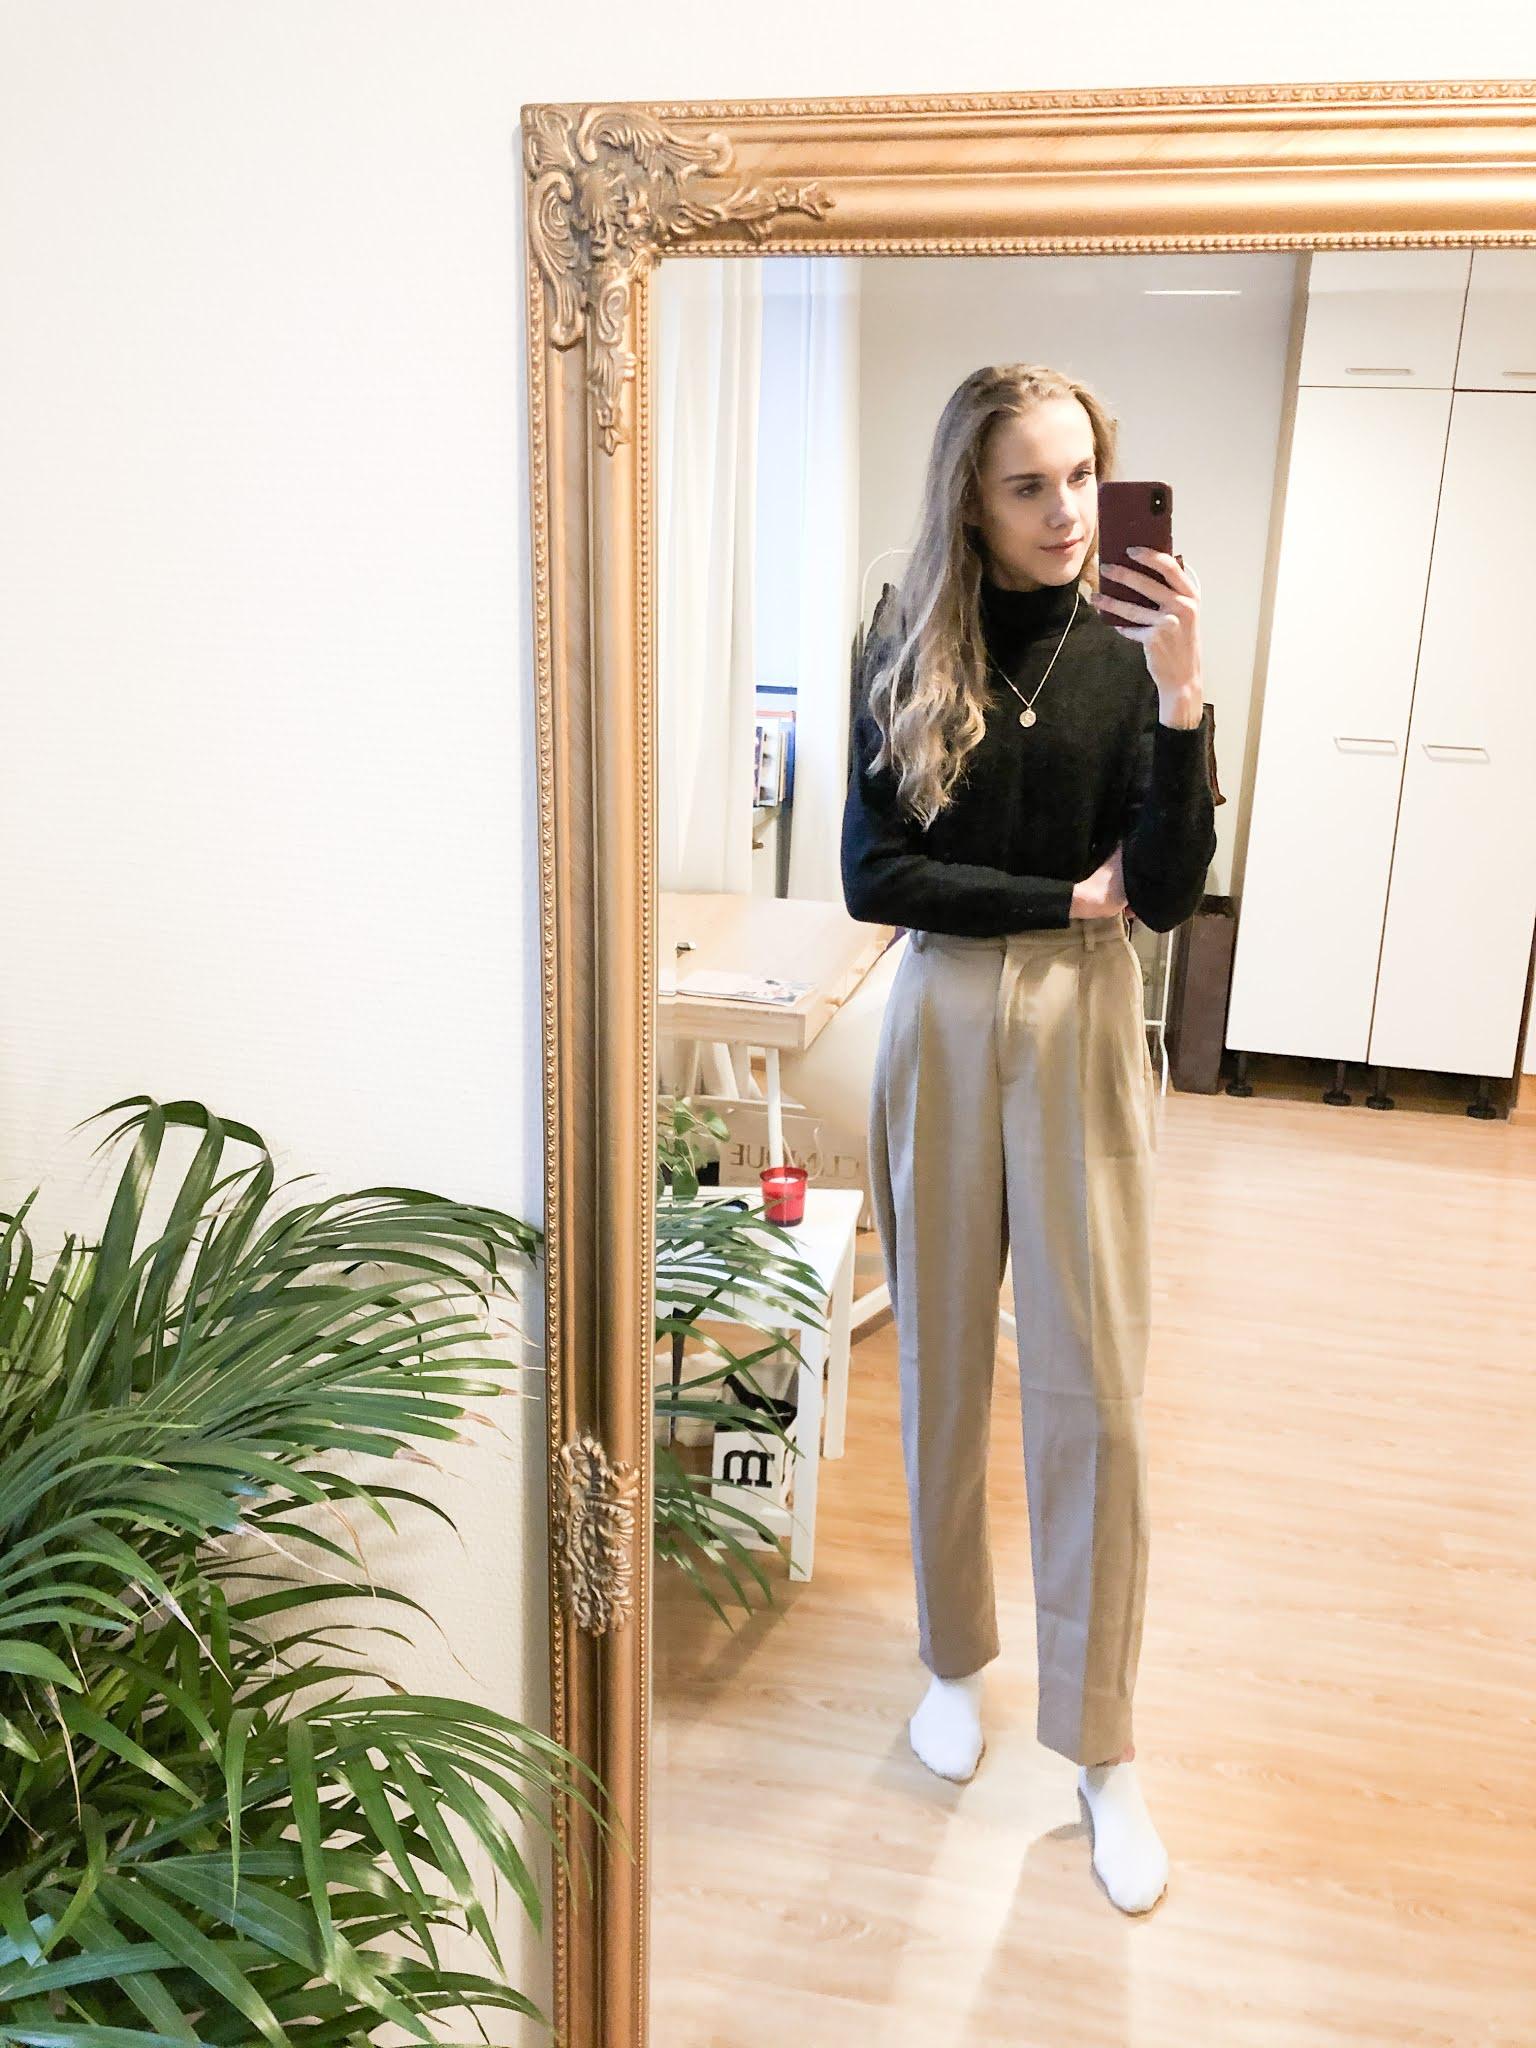 Musta kasmirpoolo ja beiget housut // Black cashmere rollneck jumper and beige trousers